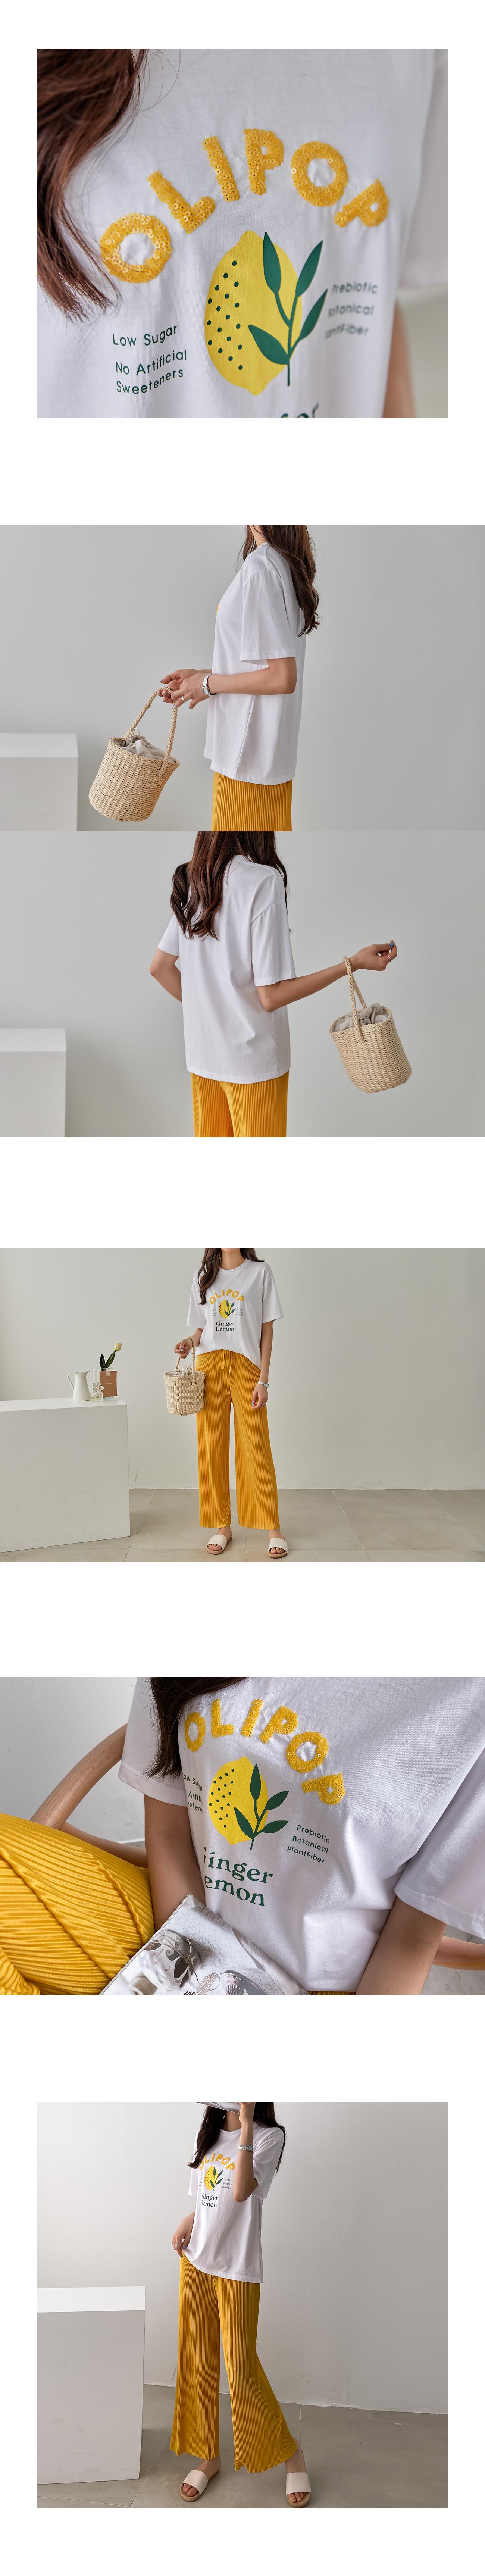 Lollipop Sequin T-shirt #108189